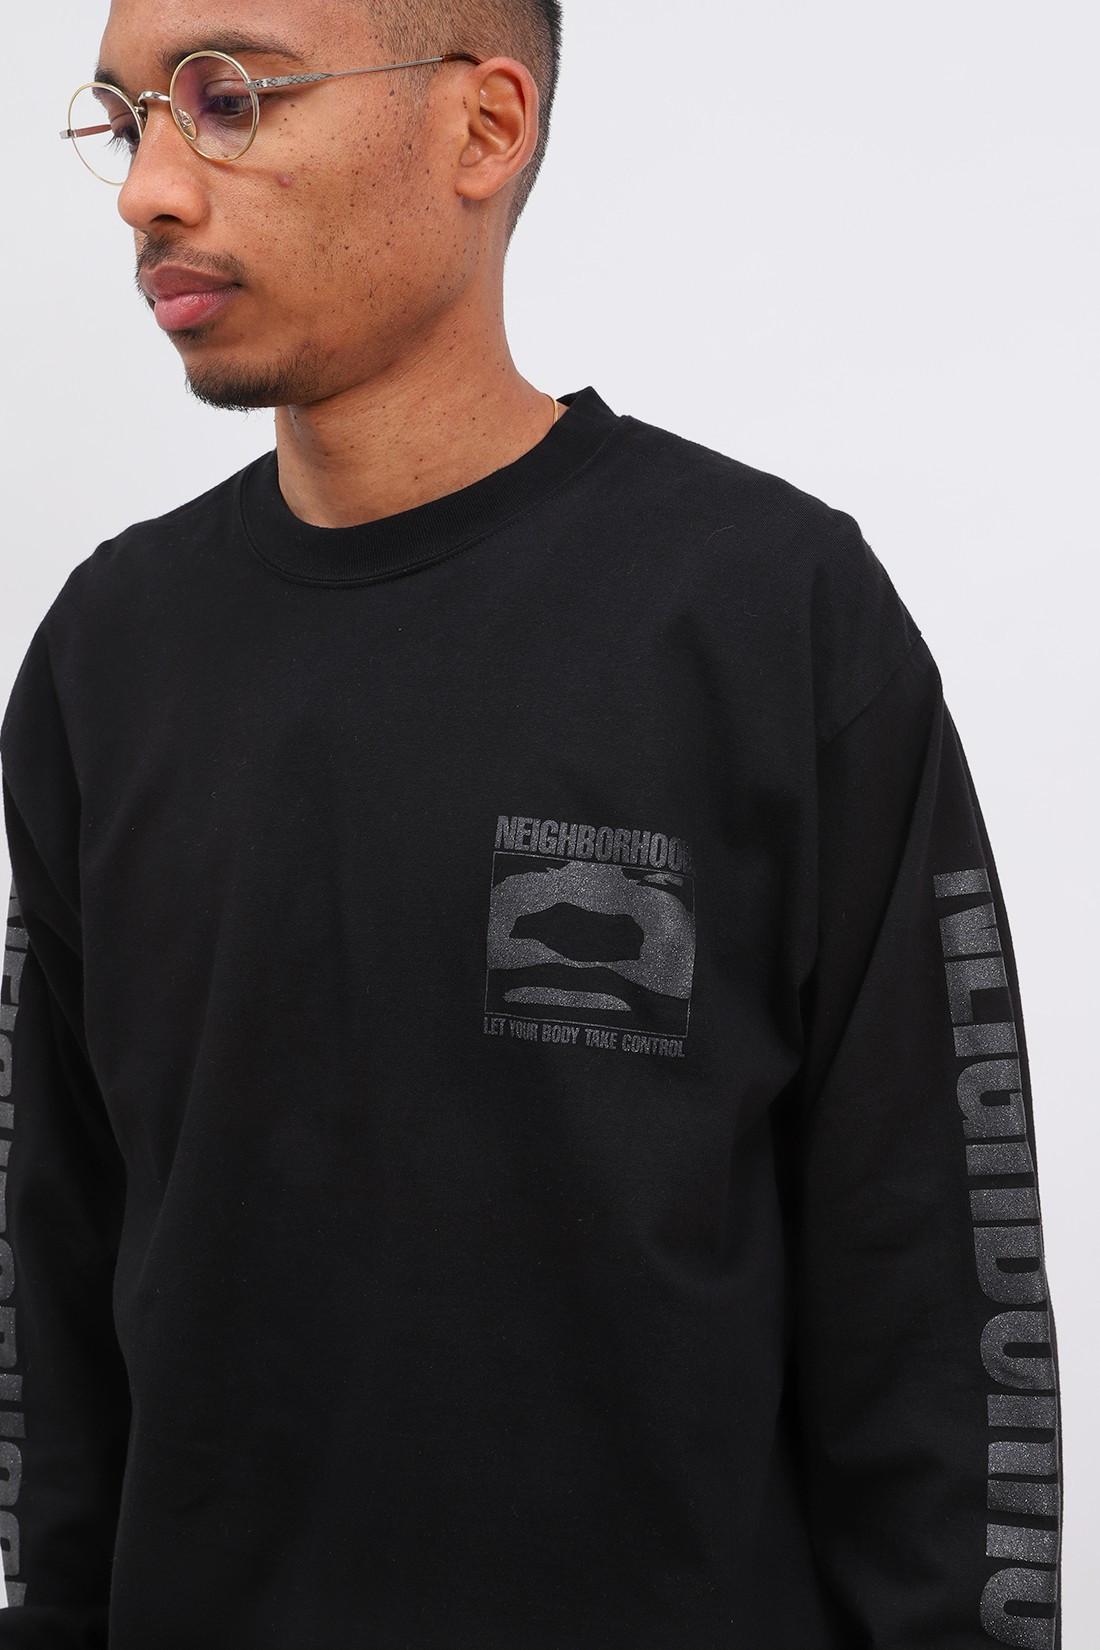 NEIGHBORHOOD / God / c-tee . ls Black